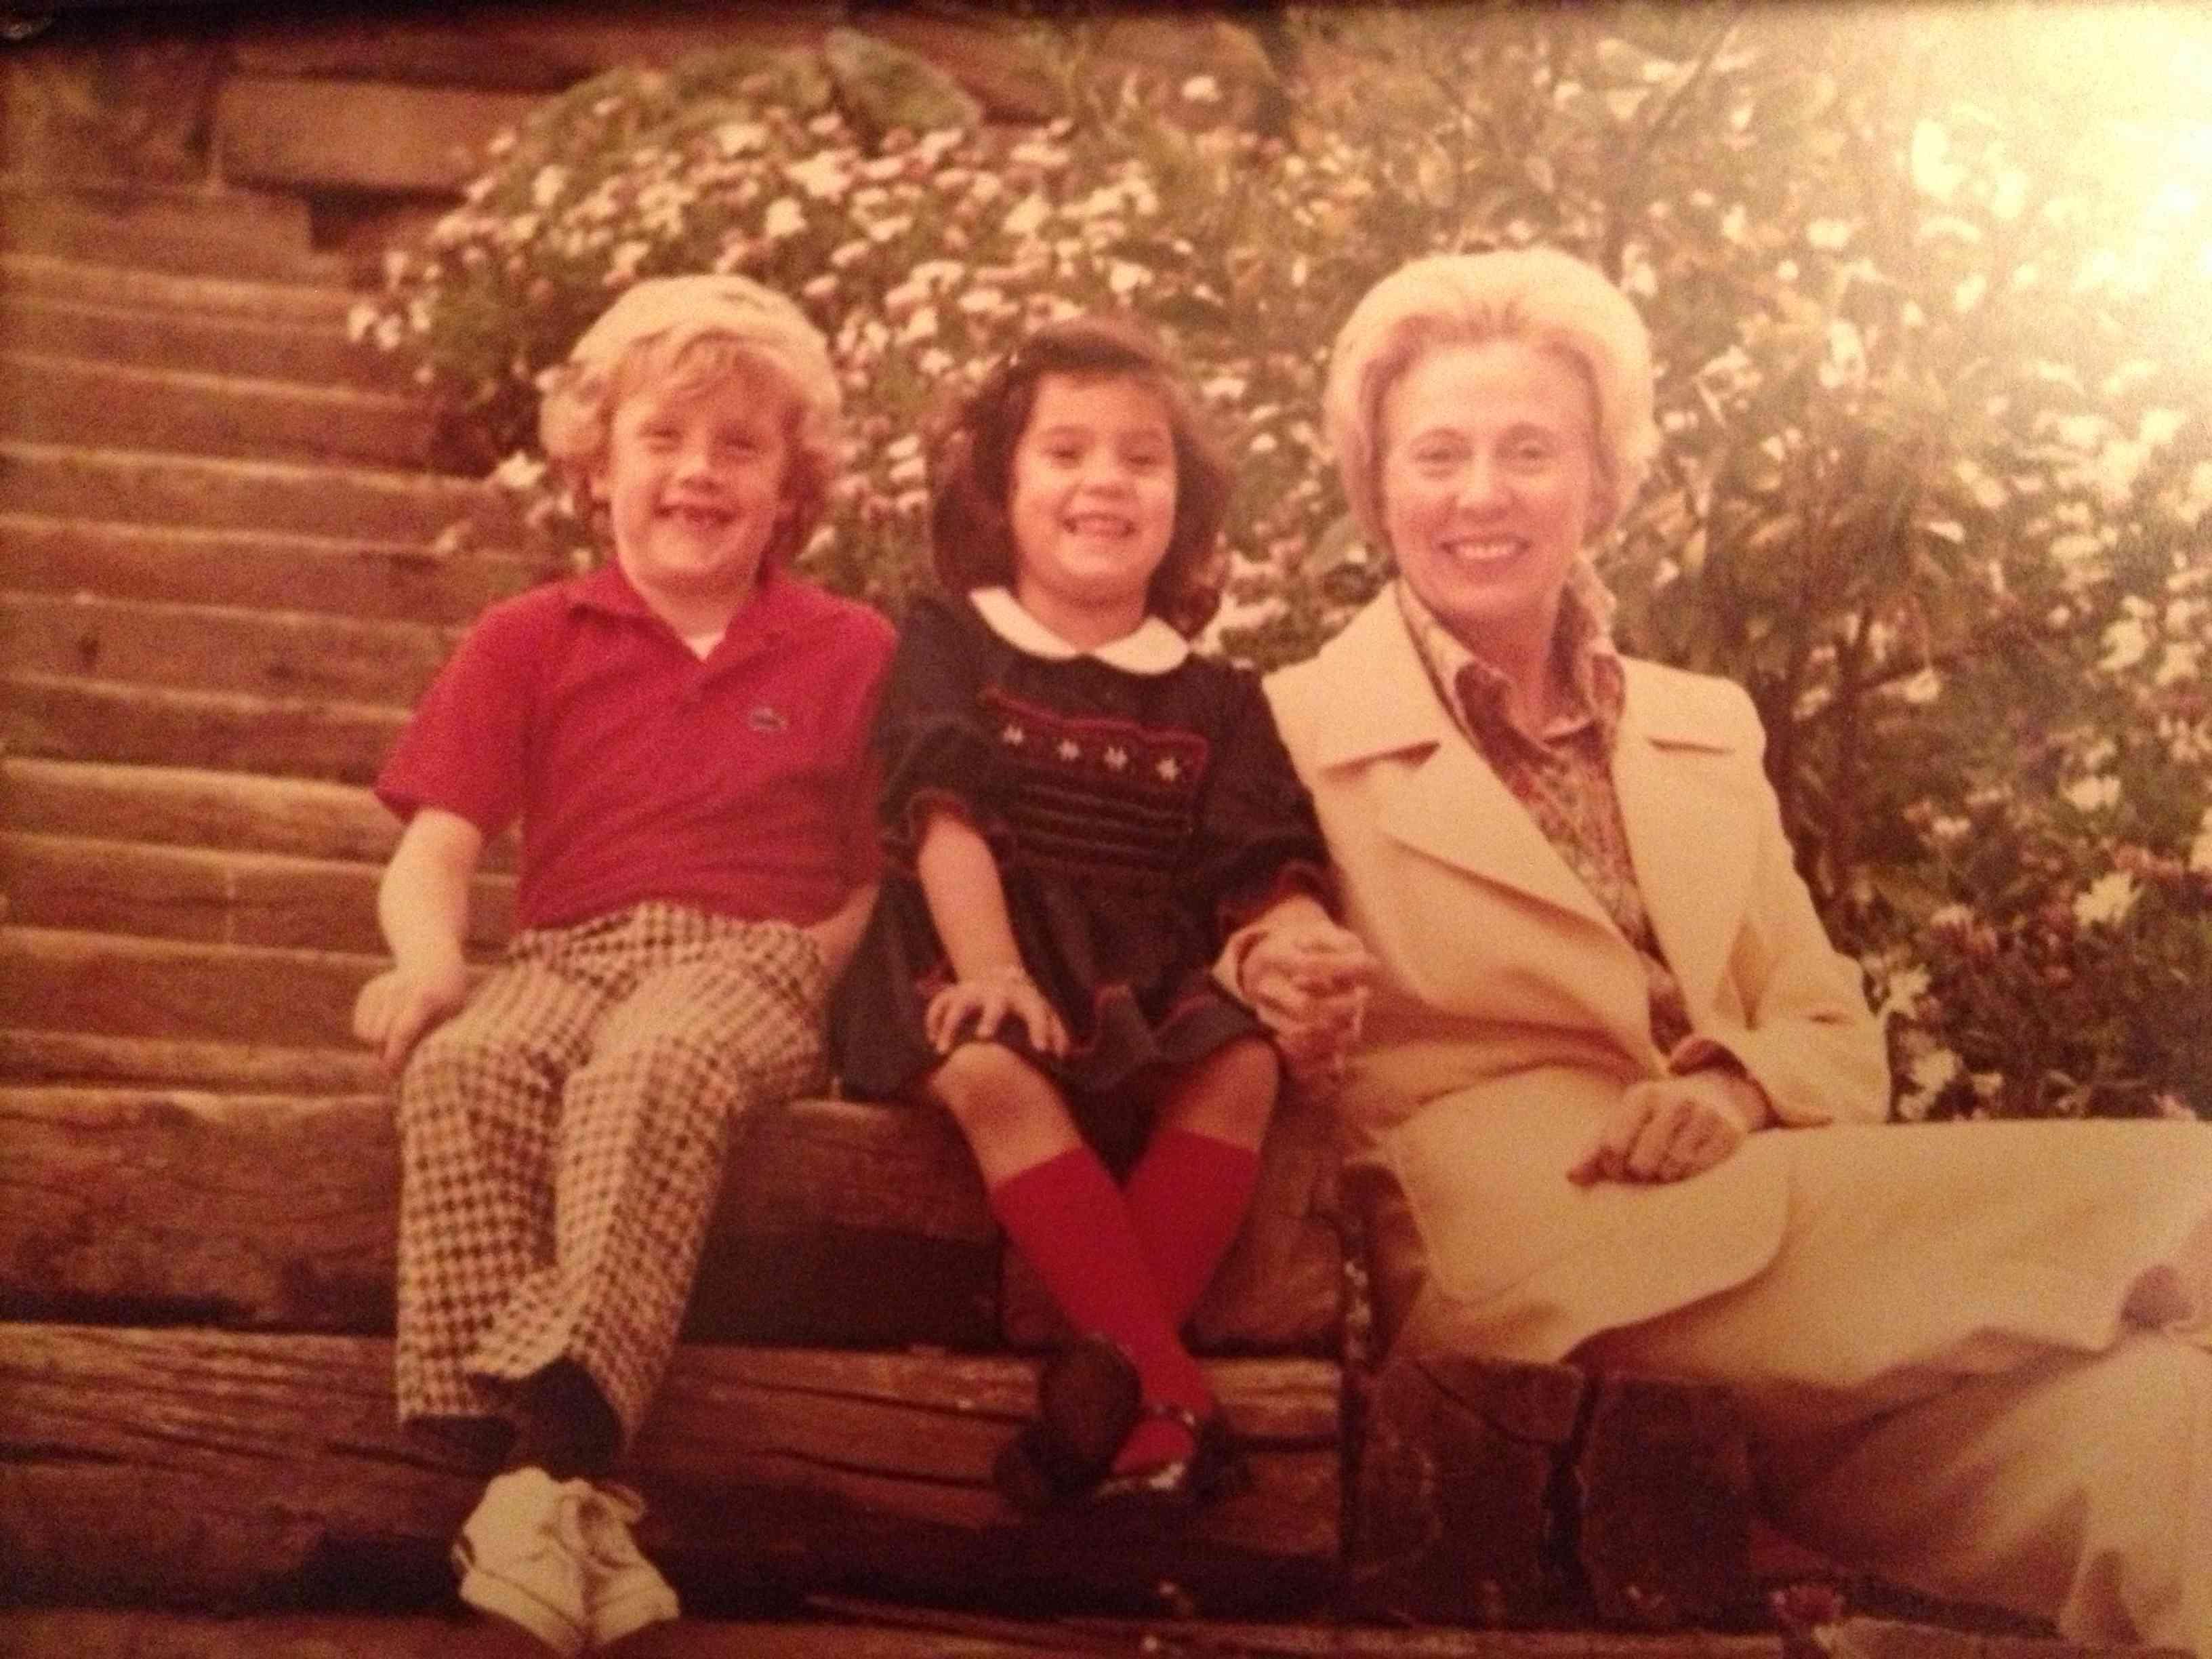 In Memoriam: Arlene Mae Breitbart, 1925-2013